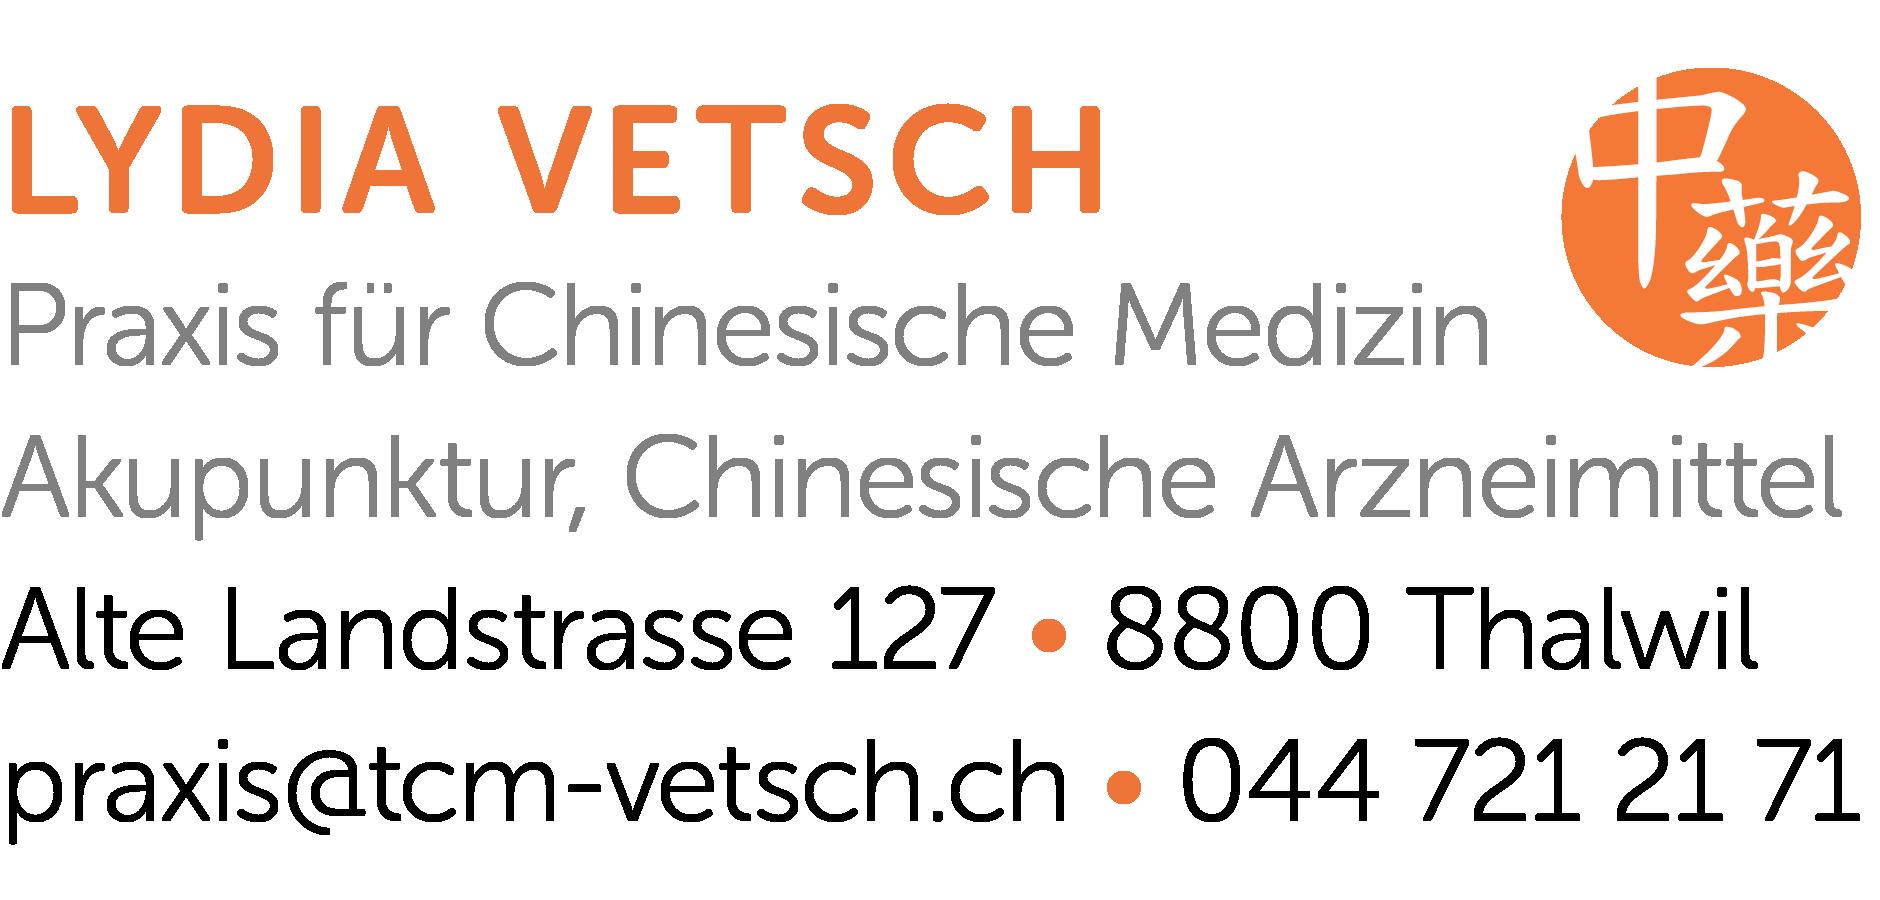 TCM • Traditionelle Chinesische Medizin • Thalwil Mobile Retina Logo